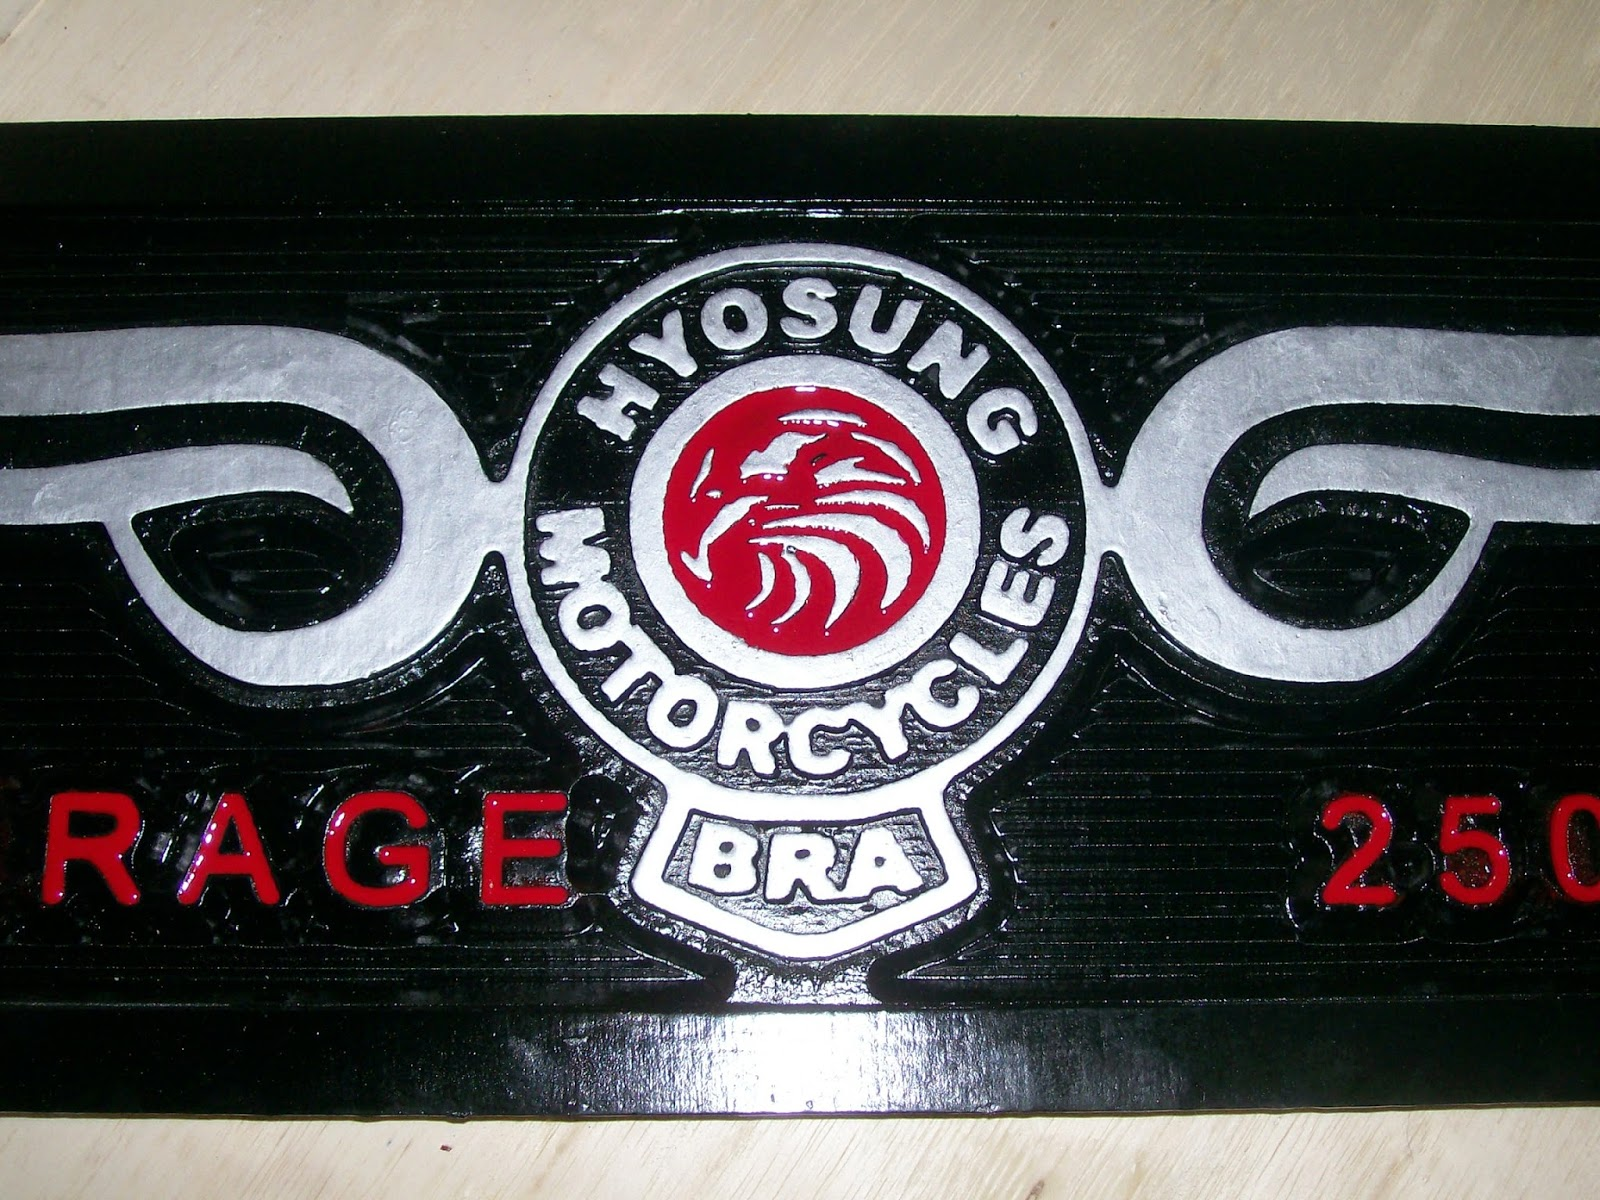 hyosung placa